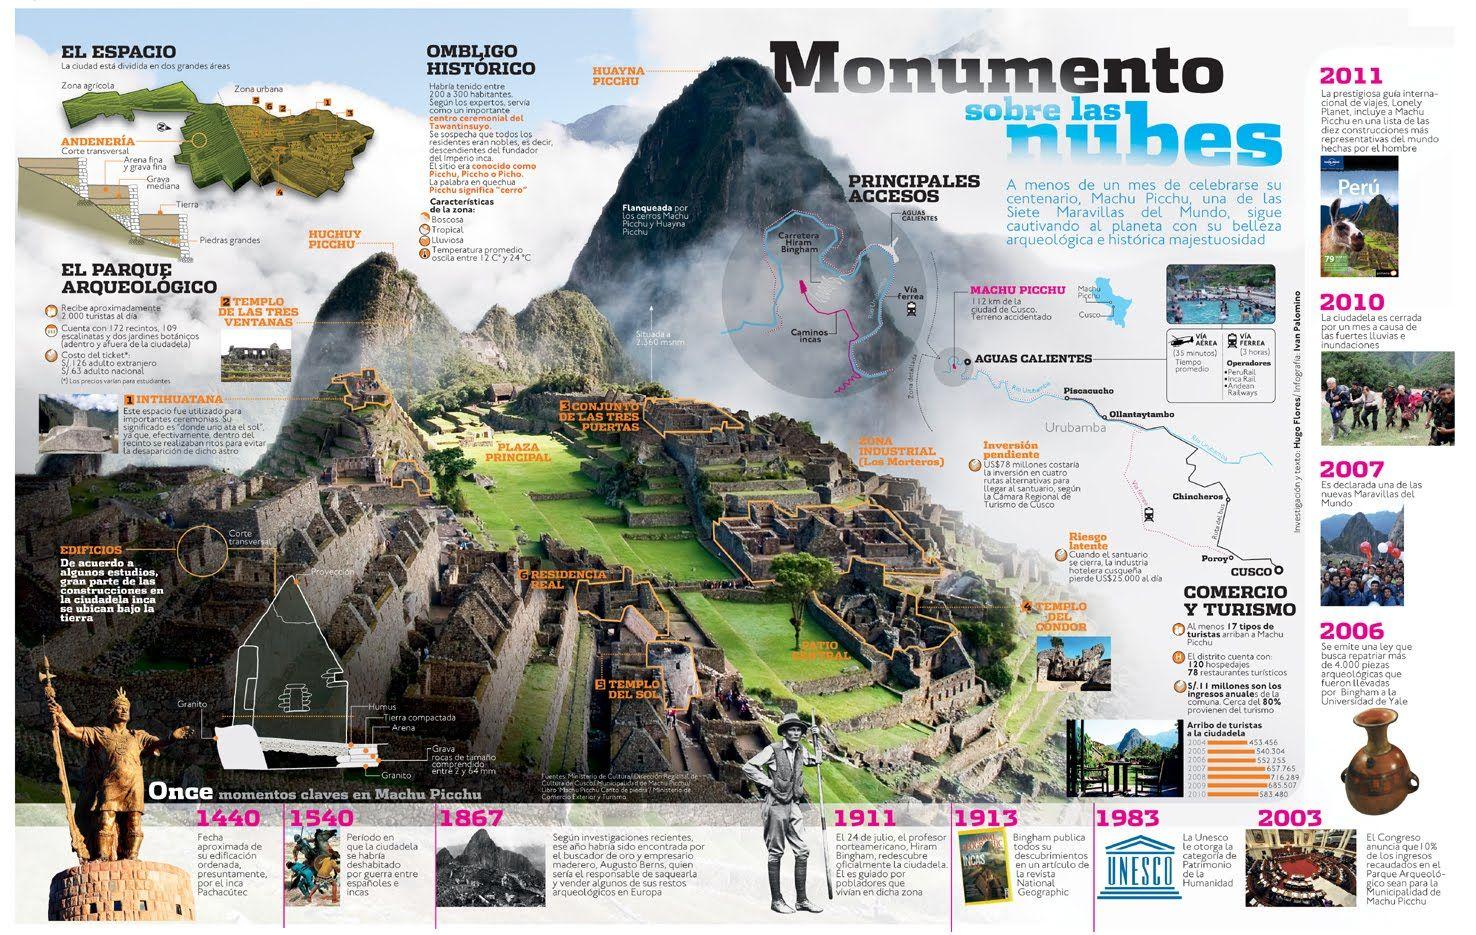 Machu Picchu Ciudad Sagrada Una De Las Siete Maravillasas Del Mundo Machu Pichu Spanish Resources Machu Picchu